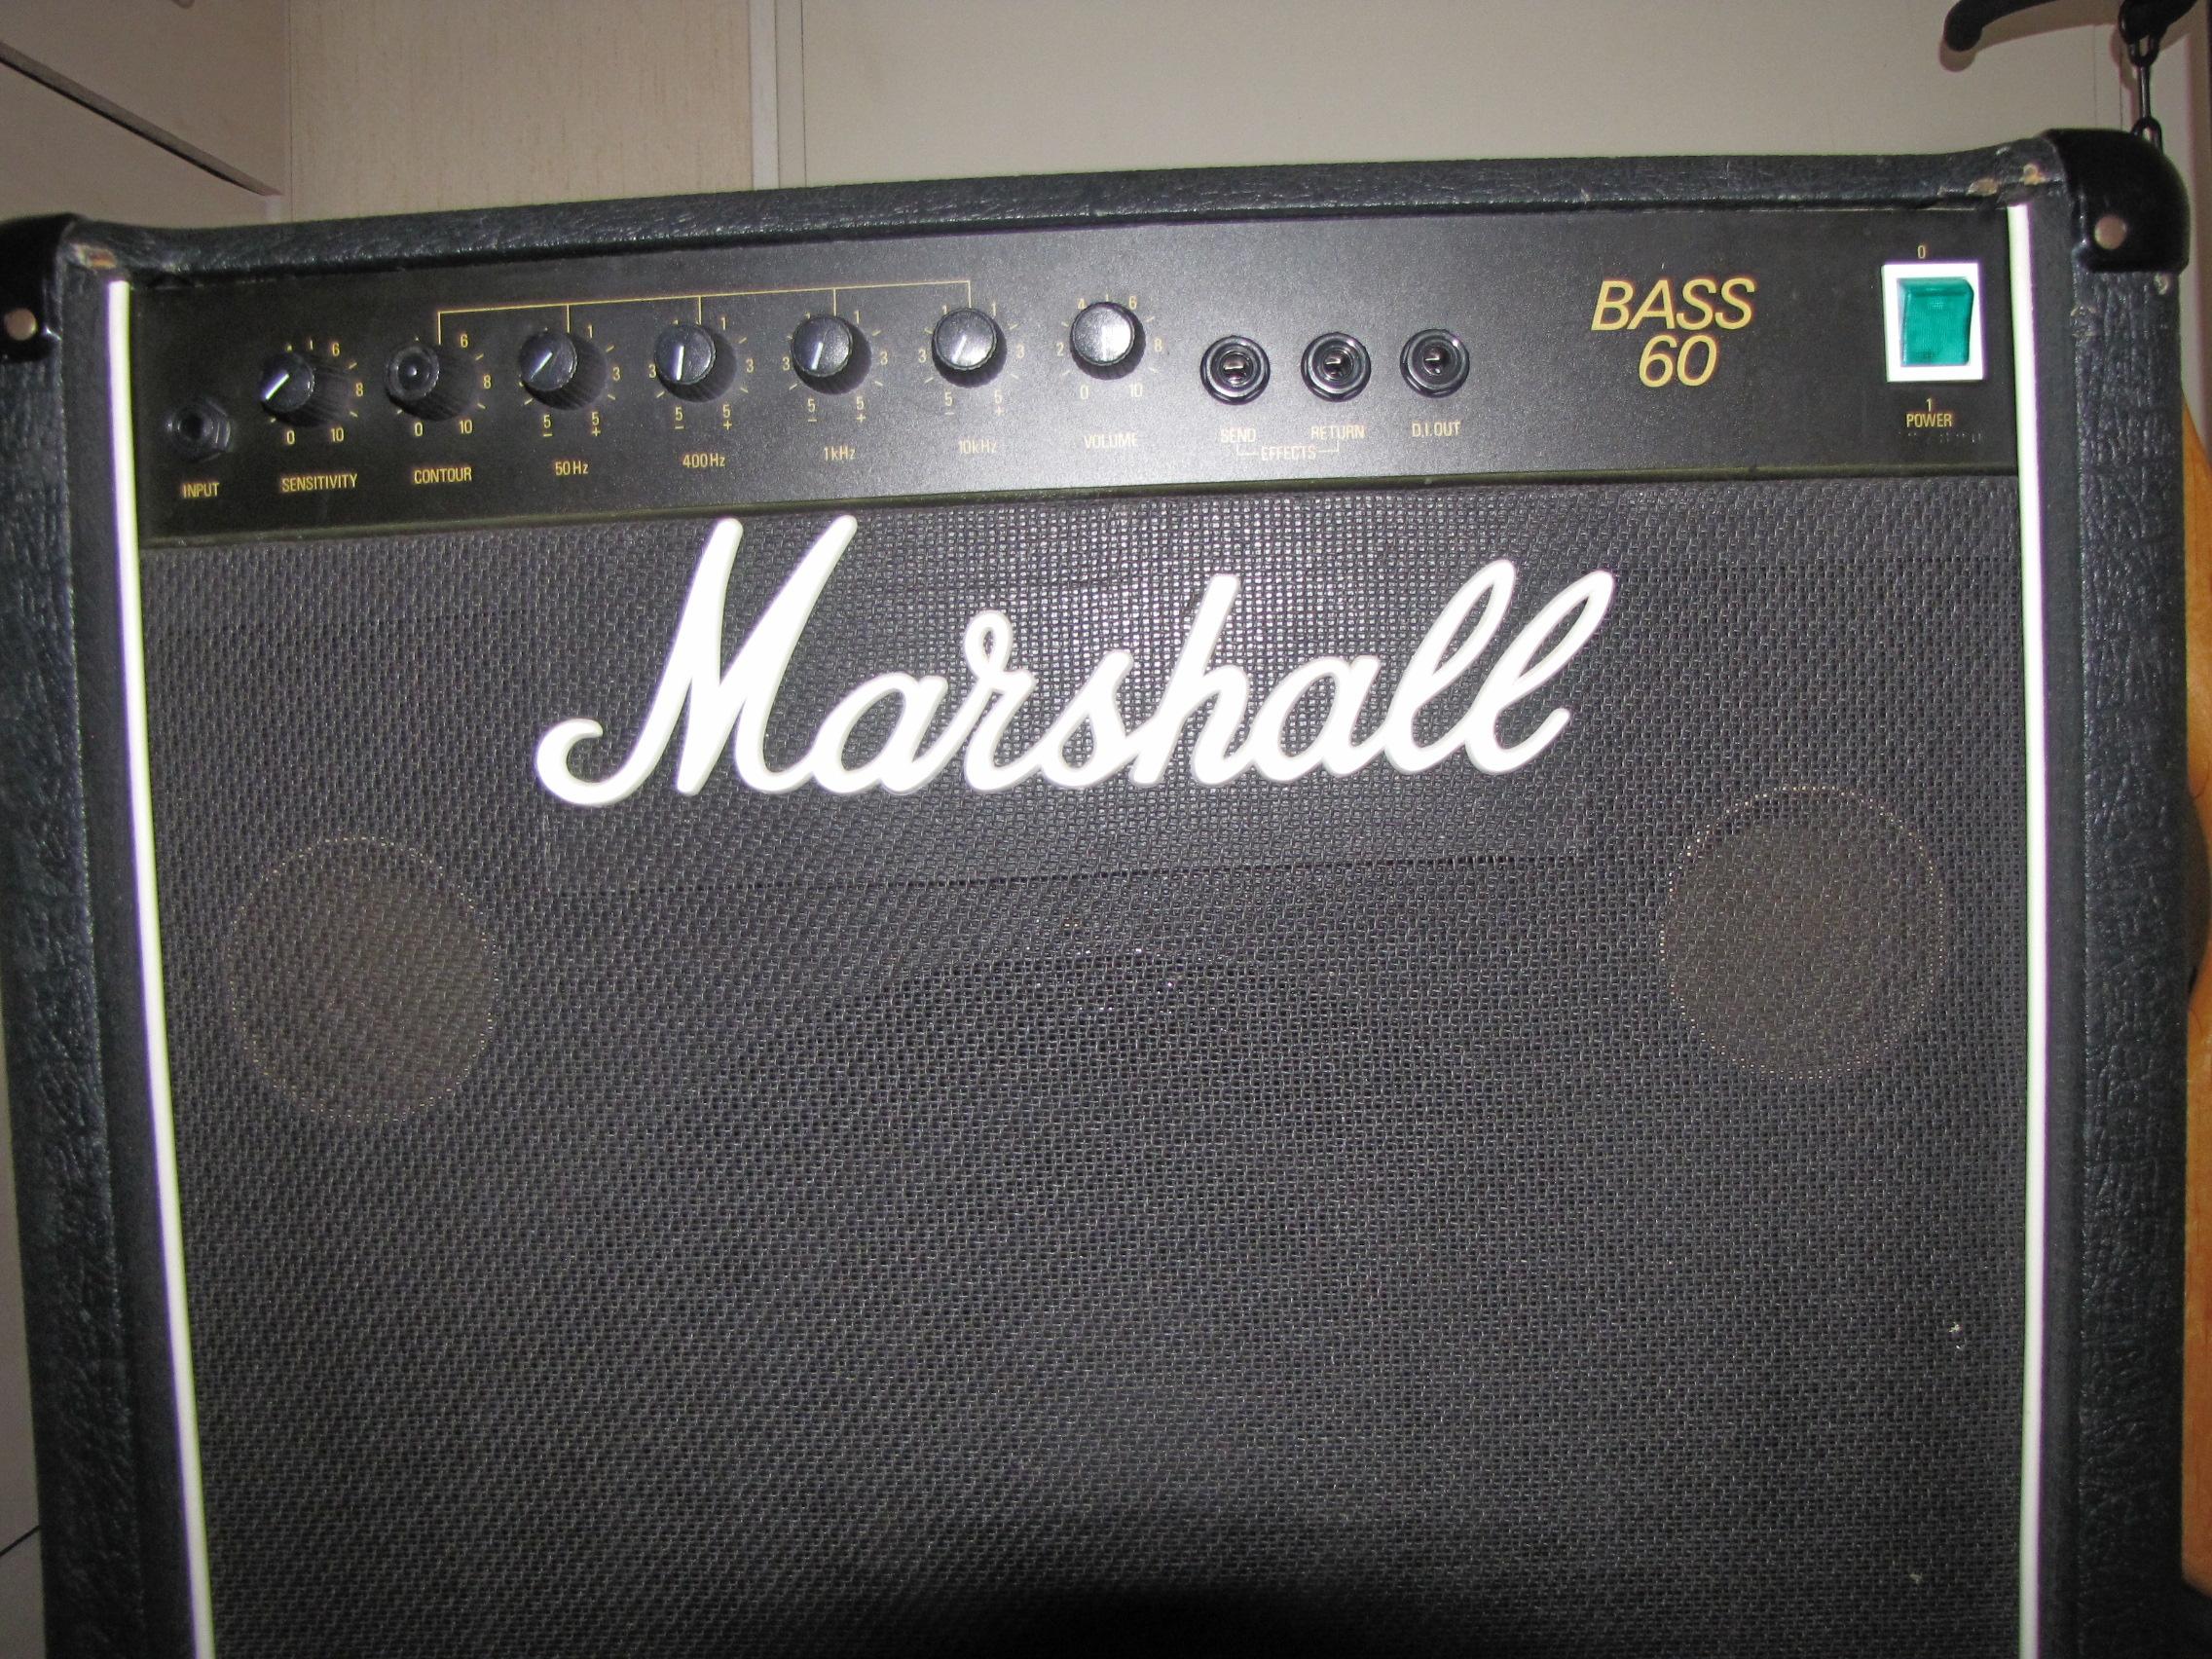 marshall 5506 jcm800 bass 60 1984 1993 image 645026 audiofanzine. Black Bedroom Furniture Sets. Home Design Ideas